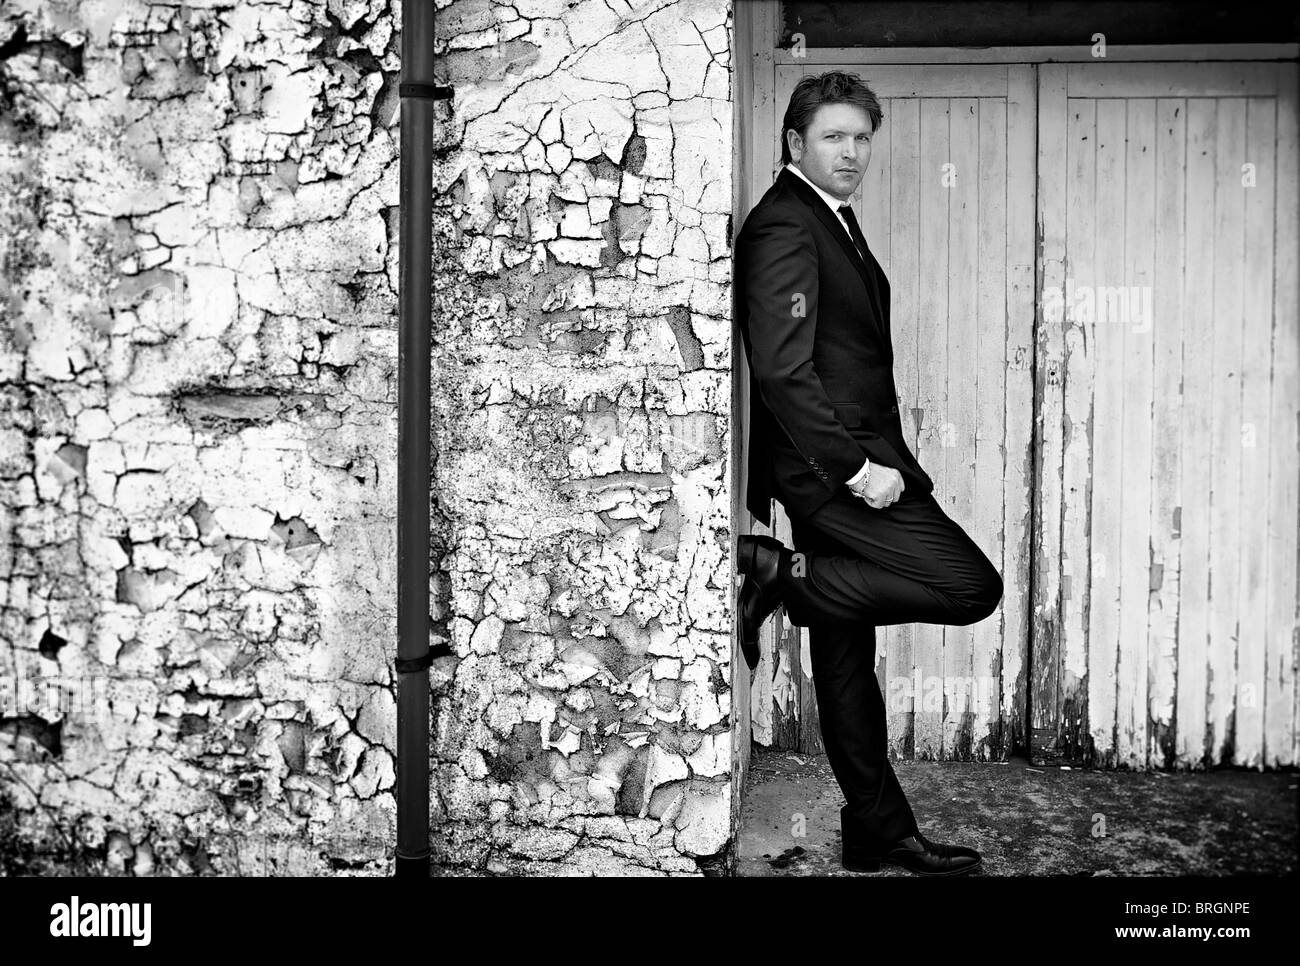 Saturday Kitchen TV Chef - James Martin - Official 2011 PR Shots - Stock Image